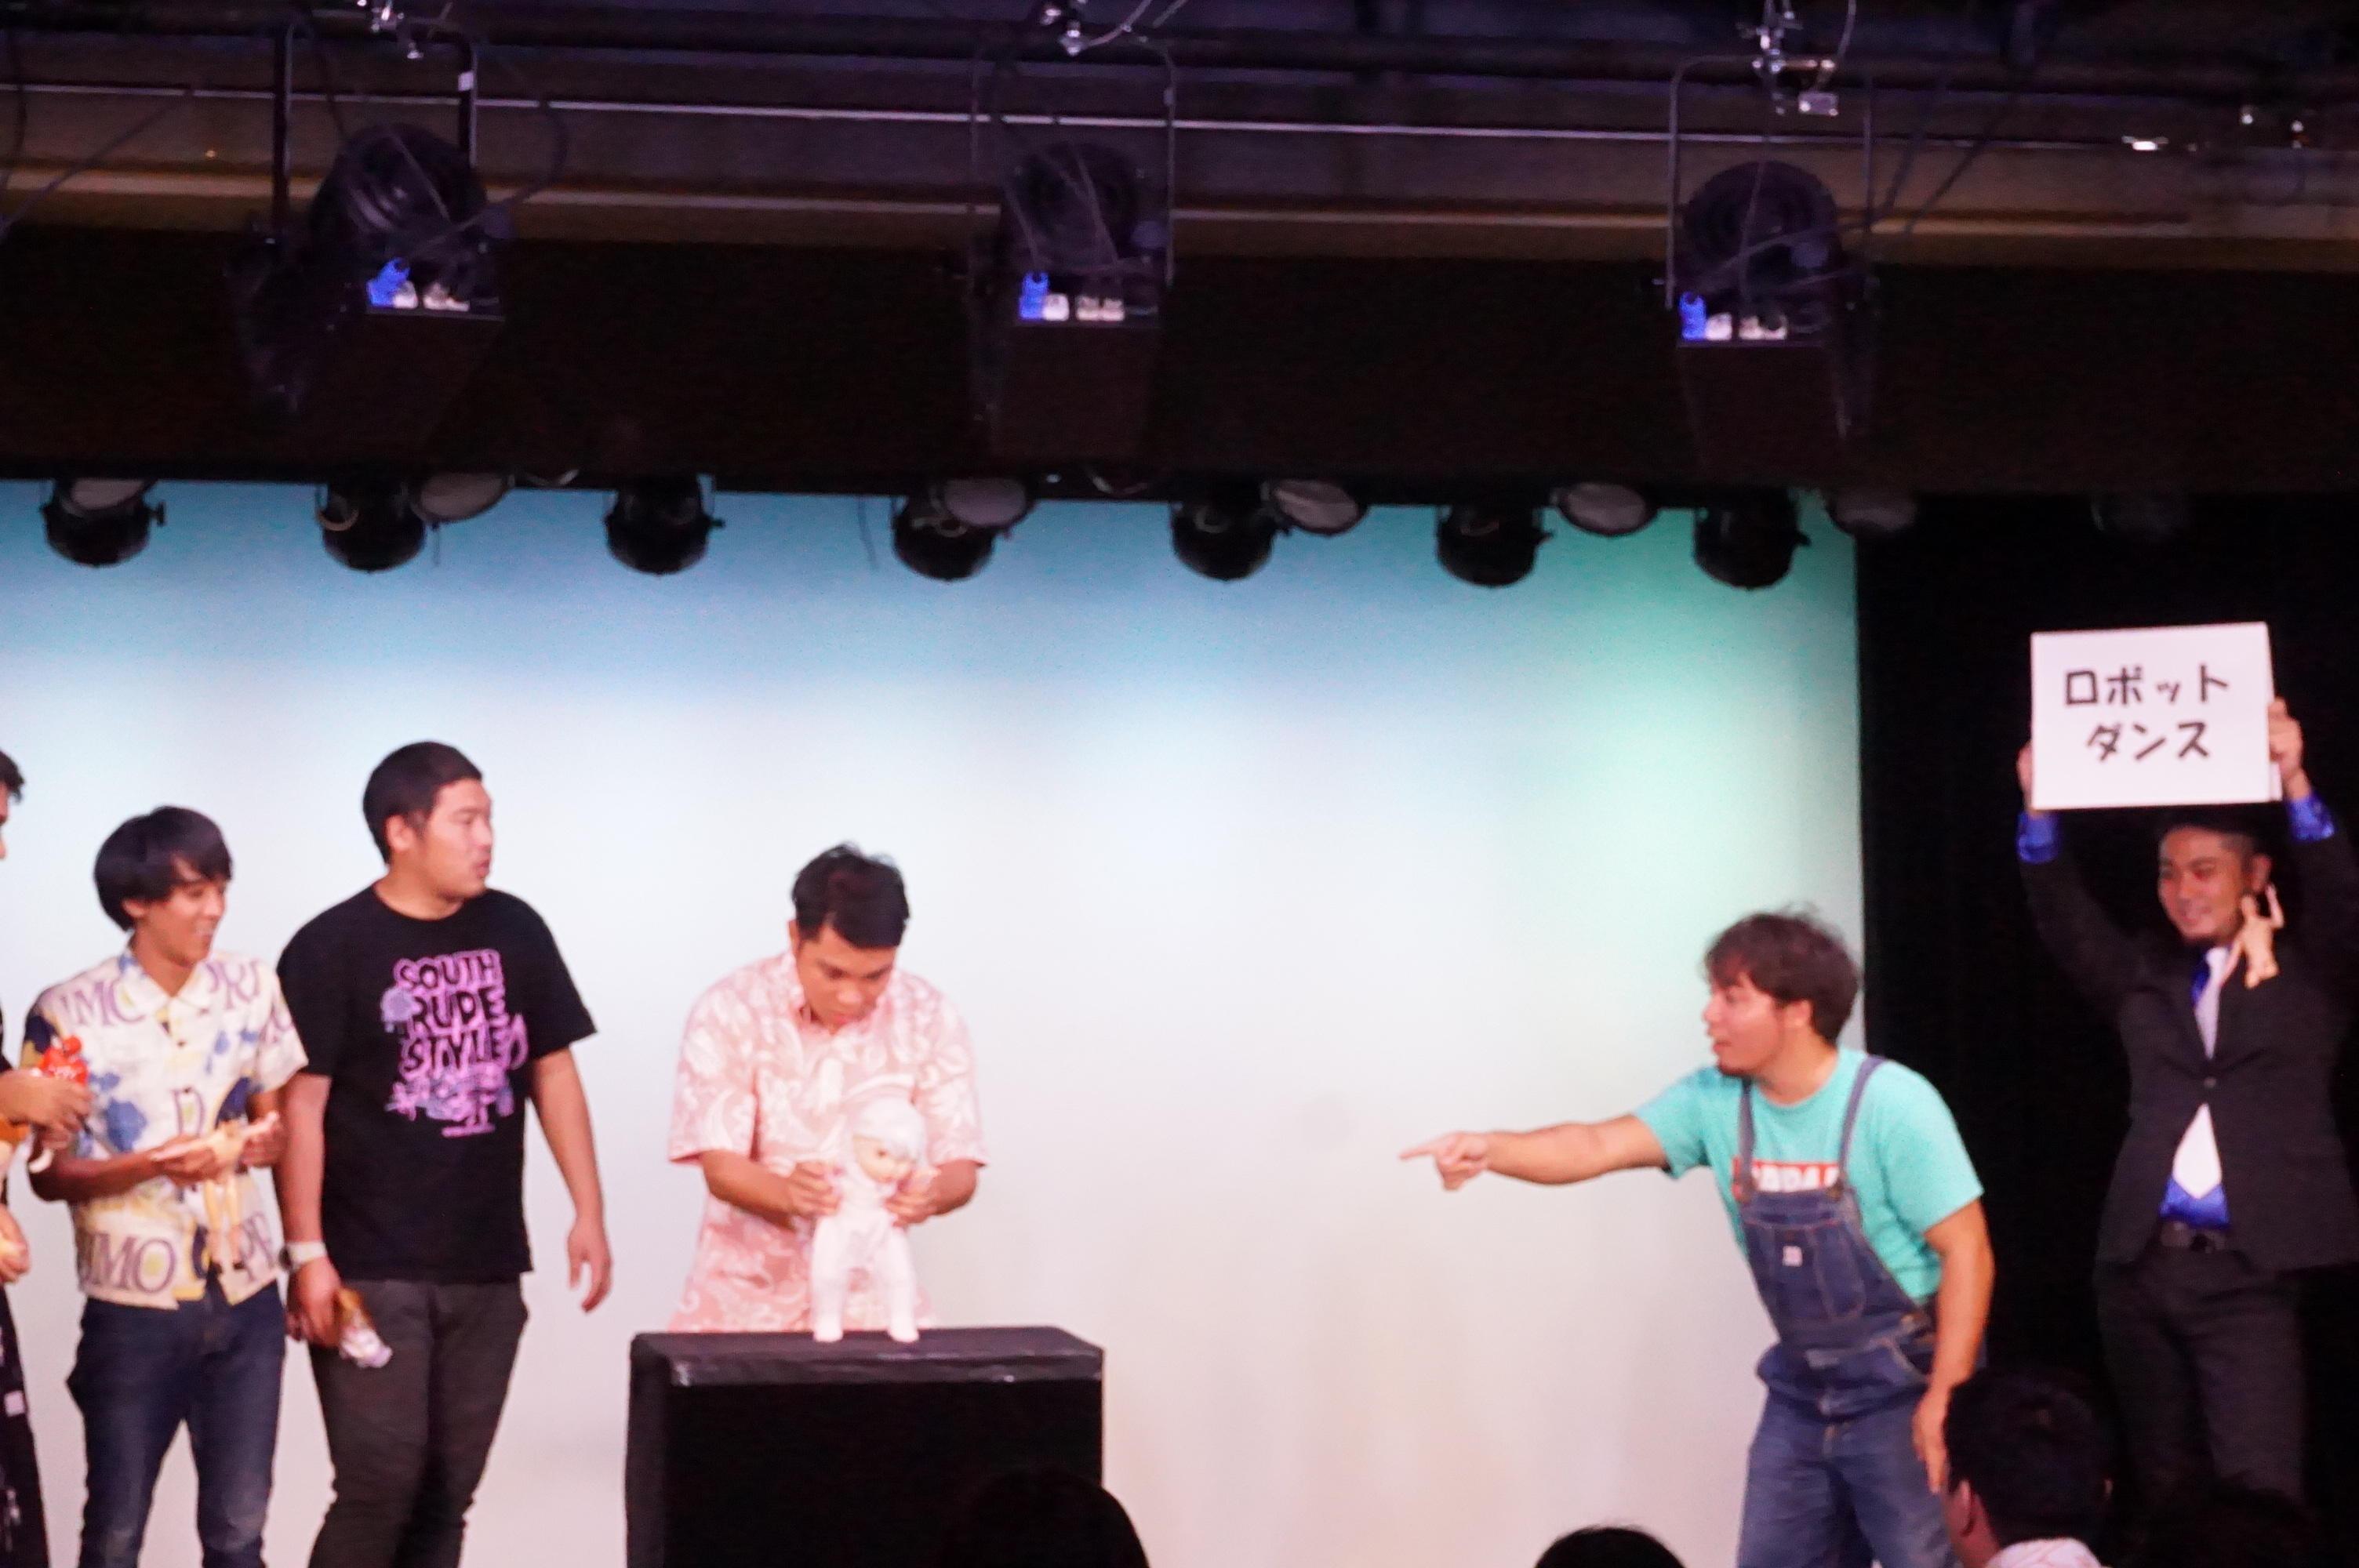 http://news.yoshimoto.co.jp/20180724165630-d70174333fcf0179773dcad6581be2c4114bbf2f.jpg